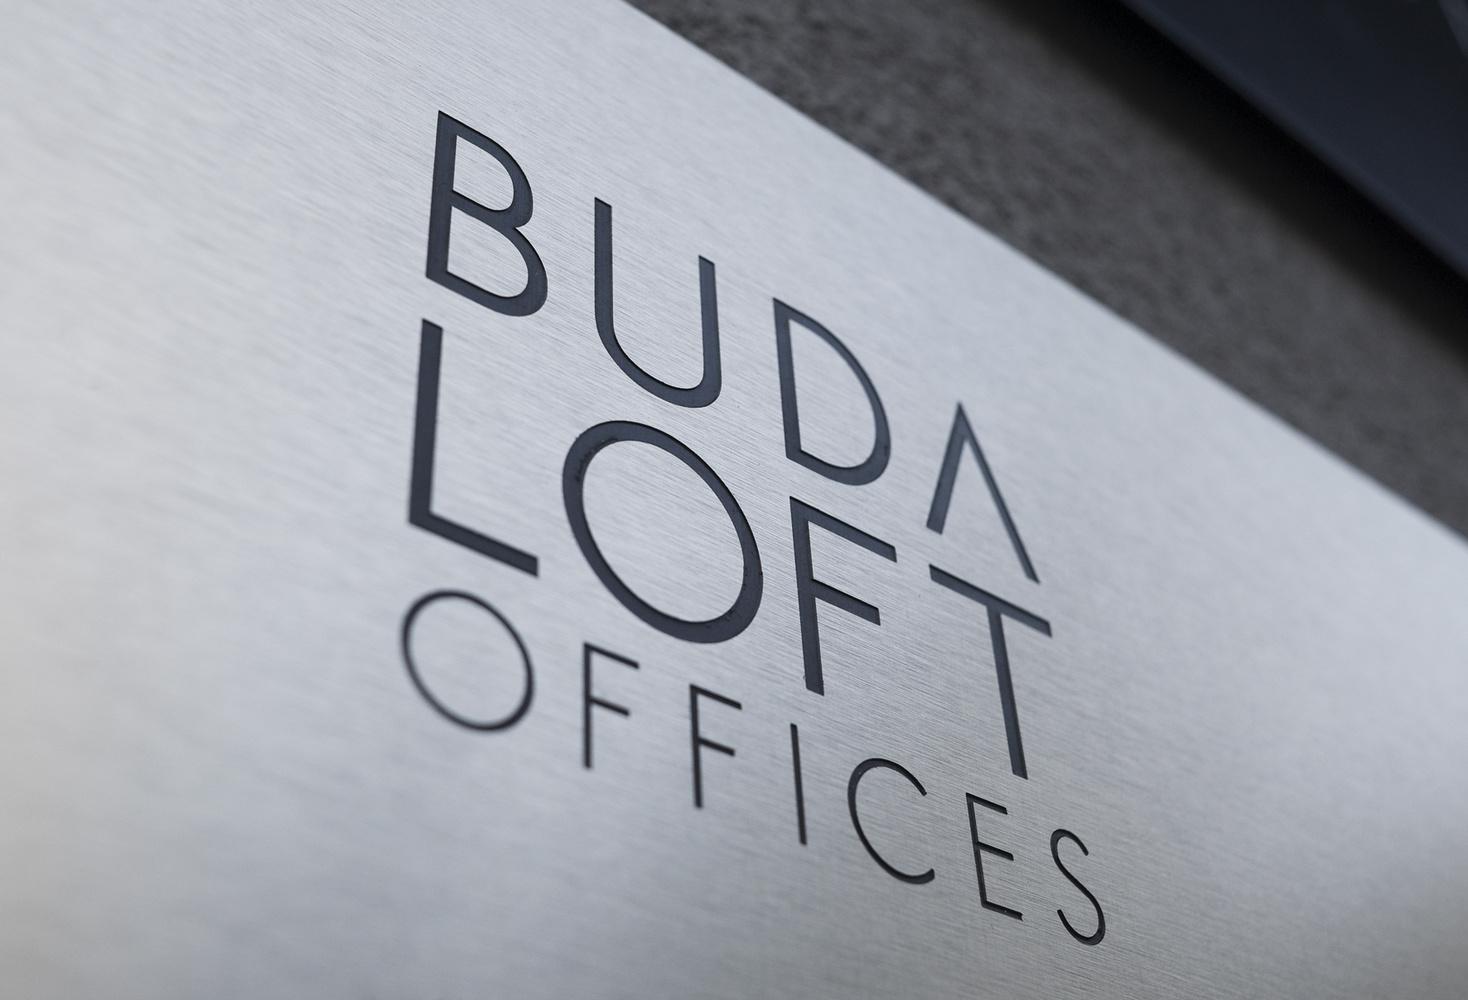 Buda loft by Stefan Gonzalevski